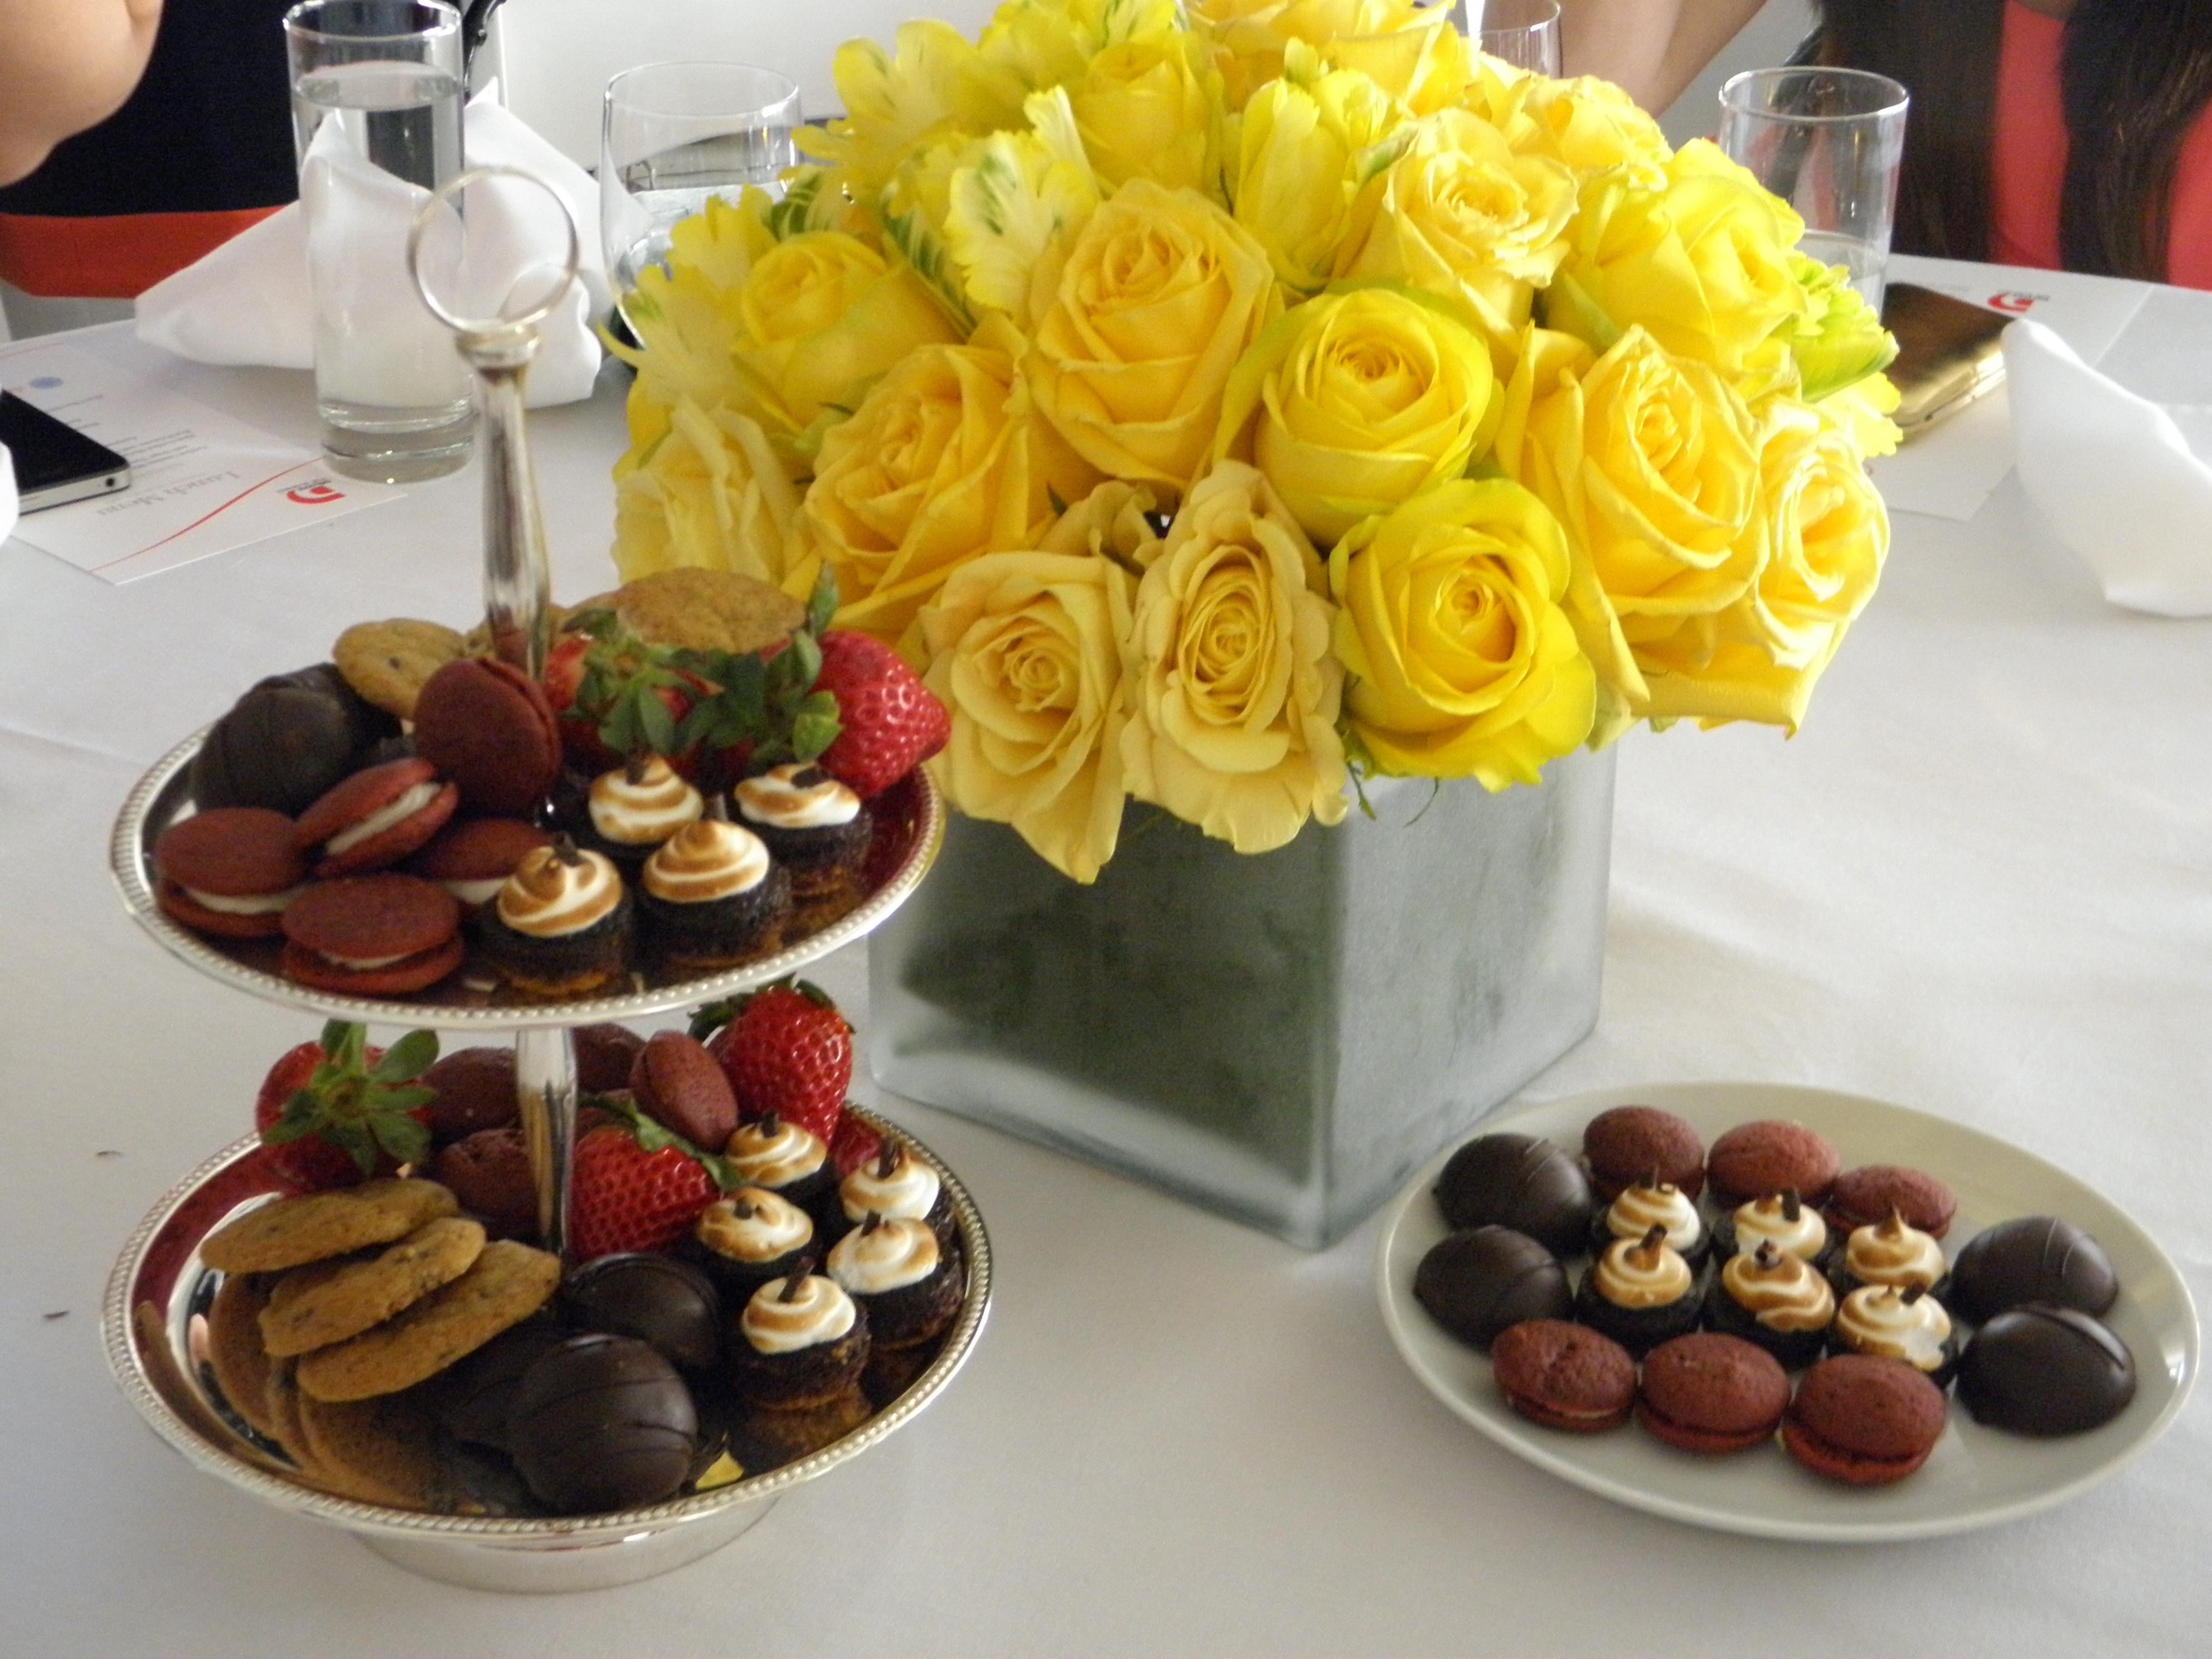 The desserts included Homemade Mini Mallomars, Red Velvet Whoopie Pies ...